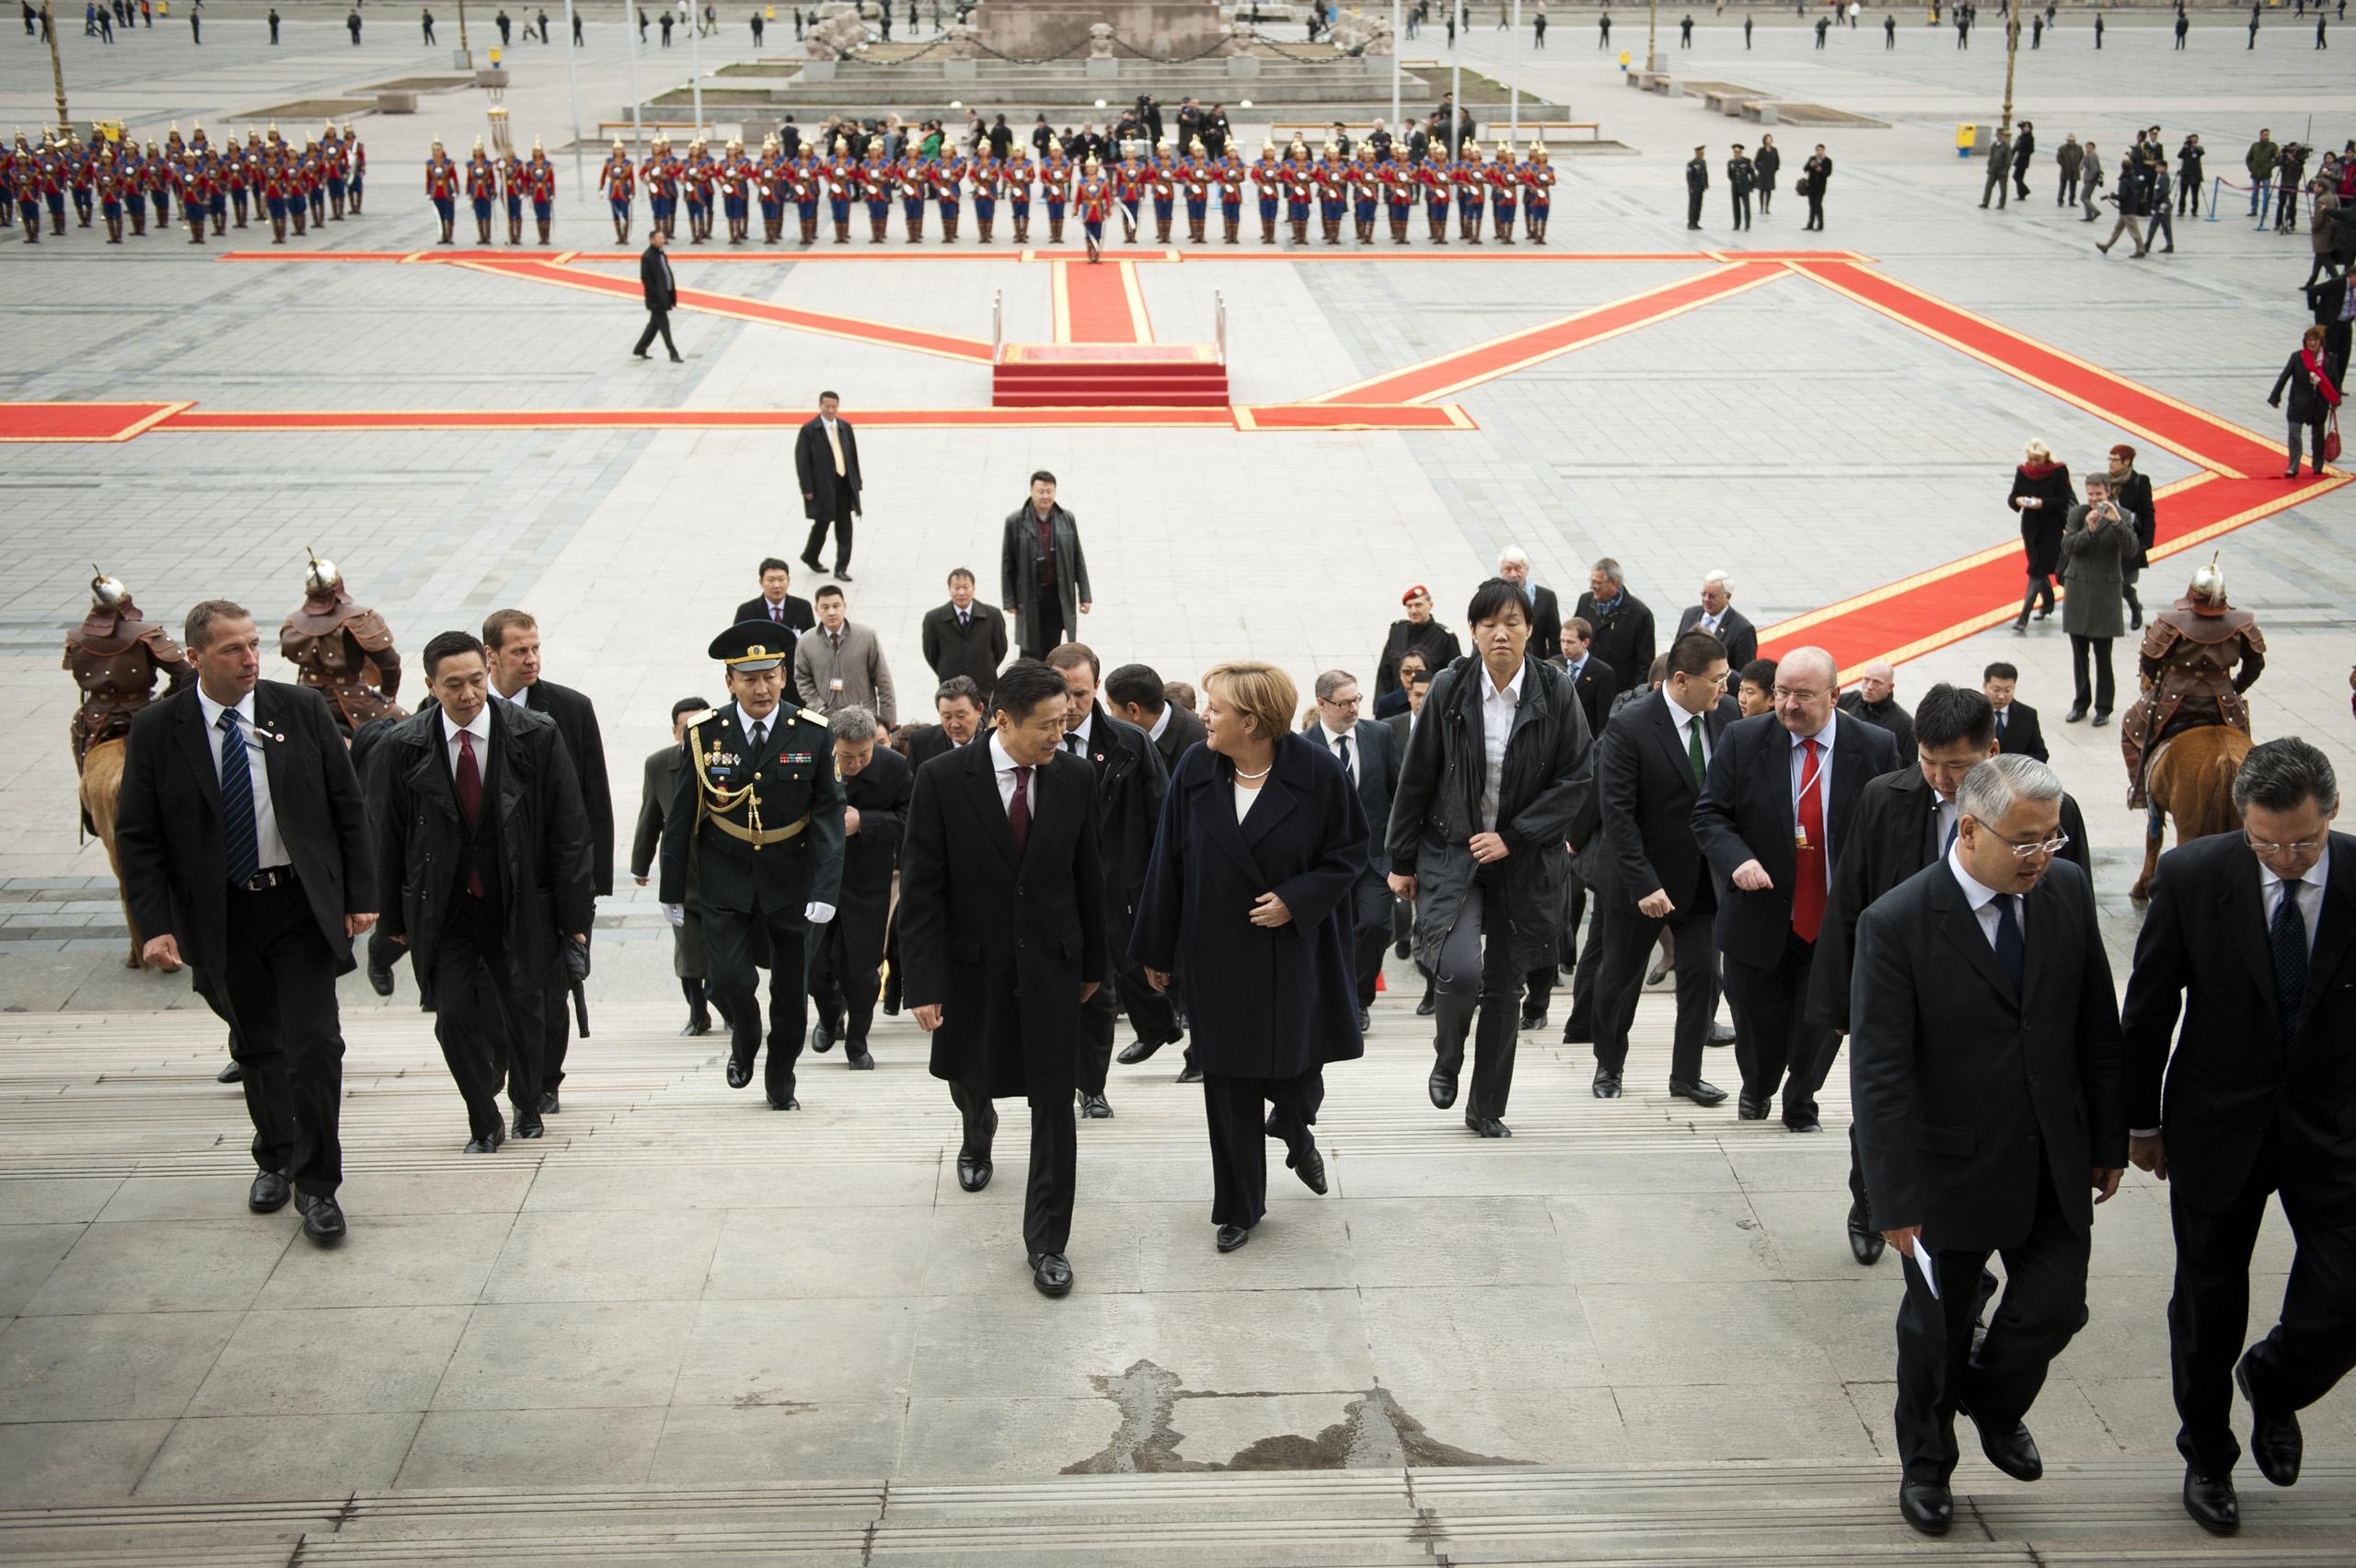 Chancellor Angela Merkel is Benimm welcomed by Mongolian Prime Minister Sukhbaatar Batbold in Ulan Bator. Oct. 13, 2011.